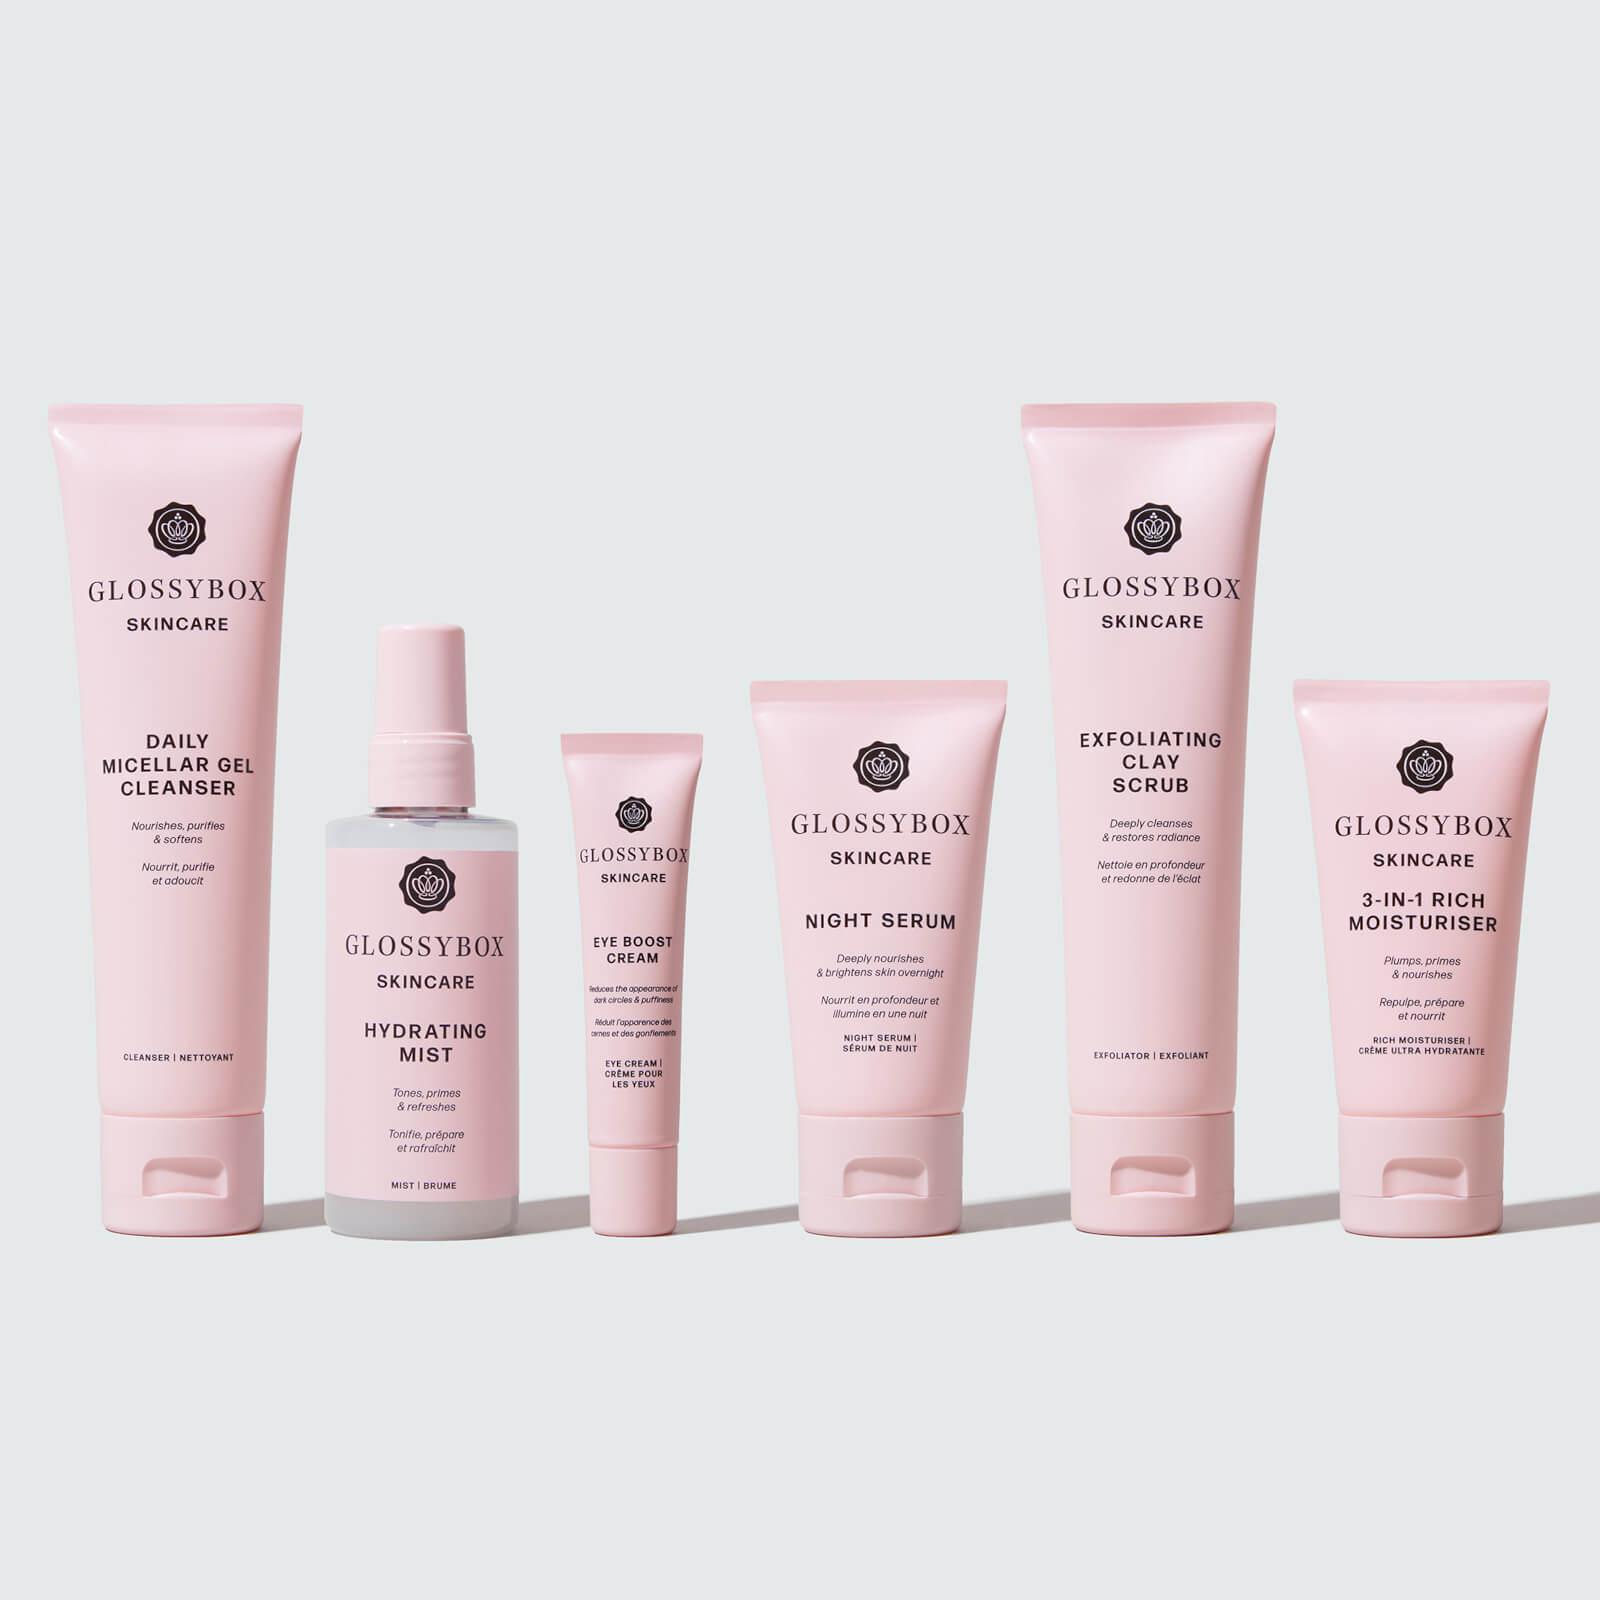 Glossy Box coupon: GLOSSYBOX Skincare Dry Skin Bundle (Worth $128.00)